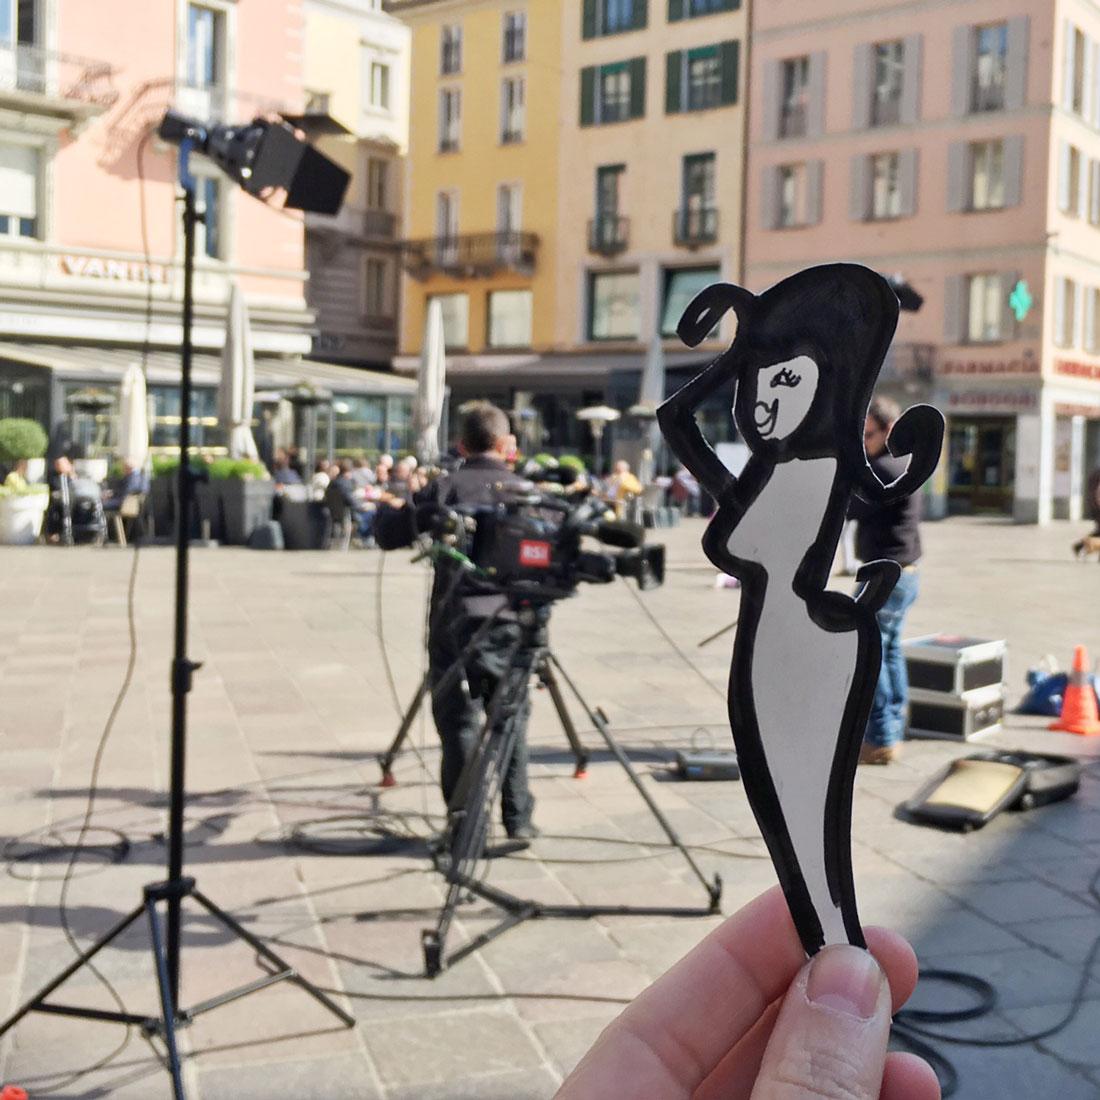 Telecamere e riflettori in città... ma chi sarà mai? Angelina? ;-)